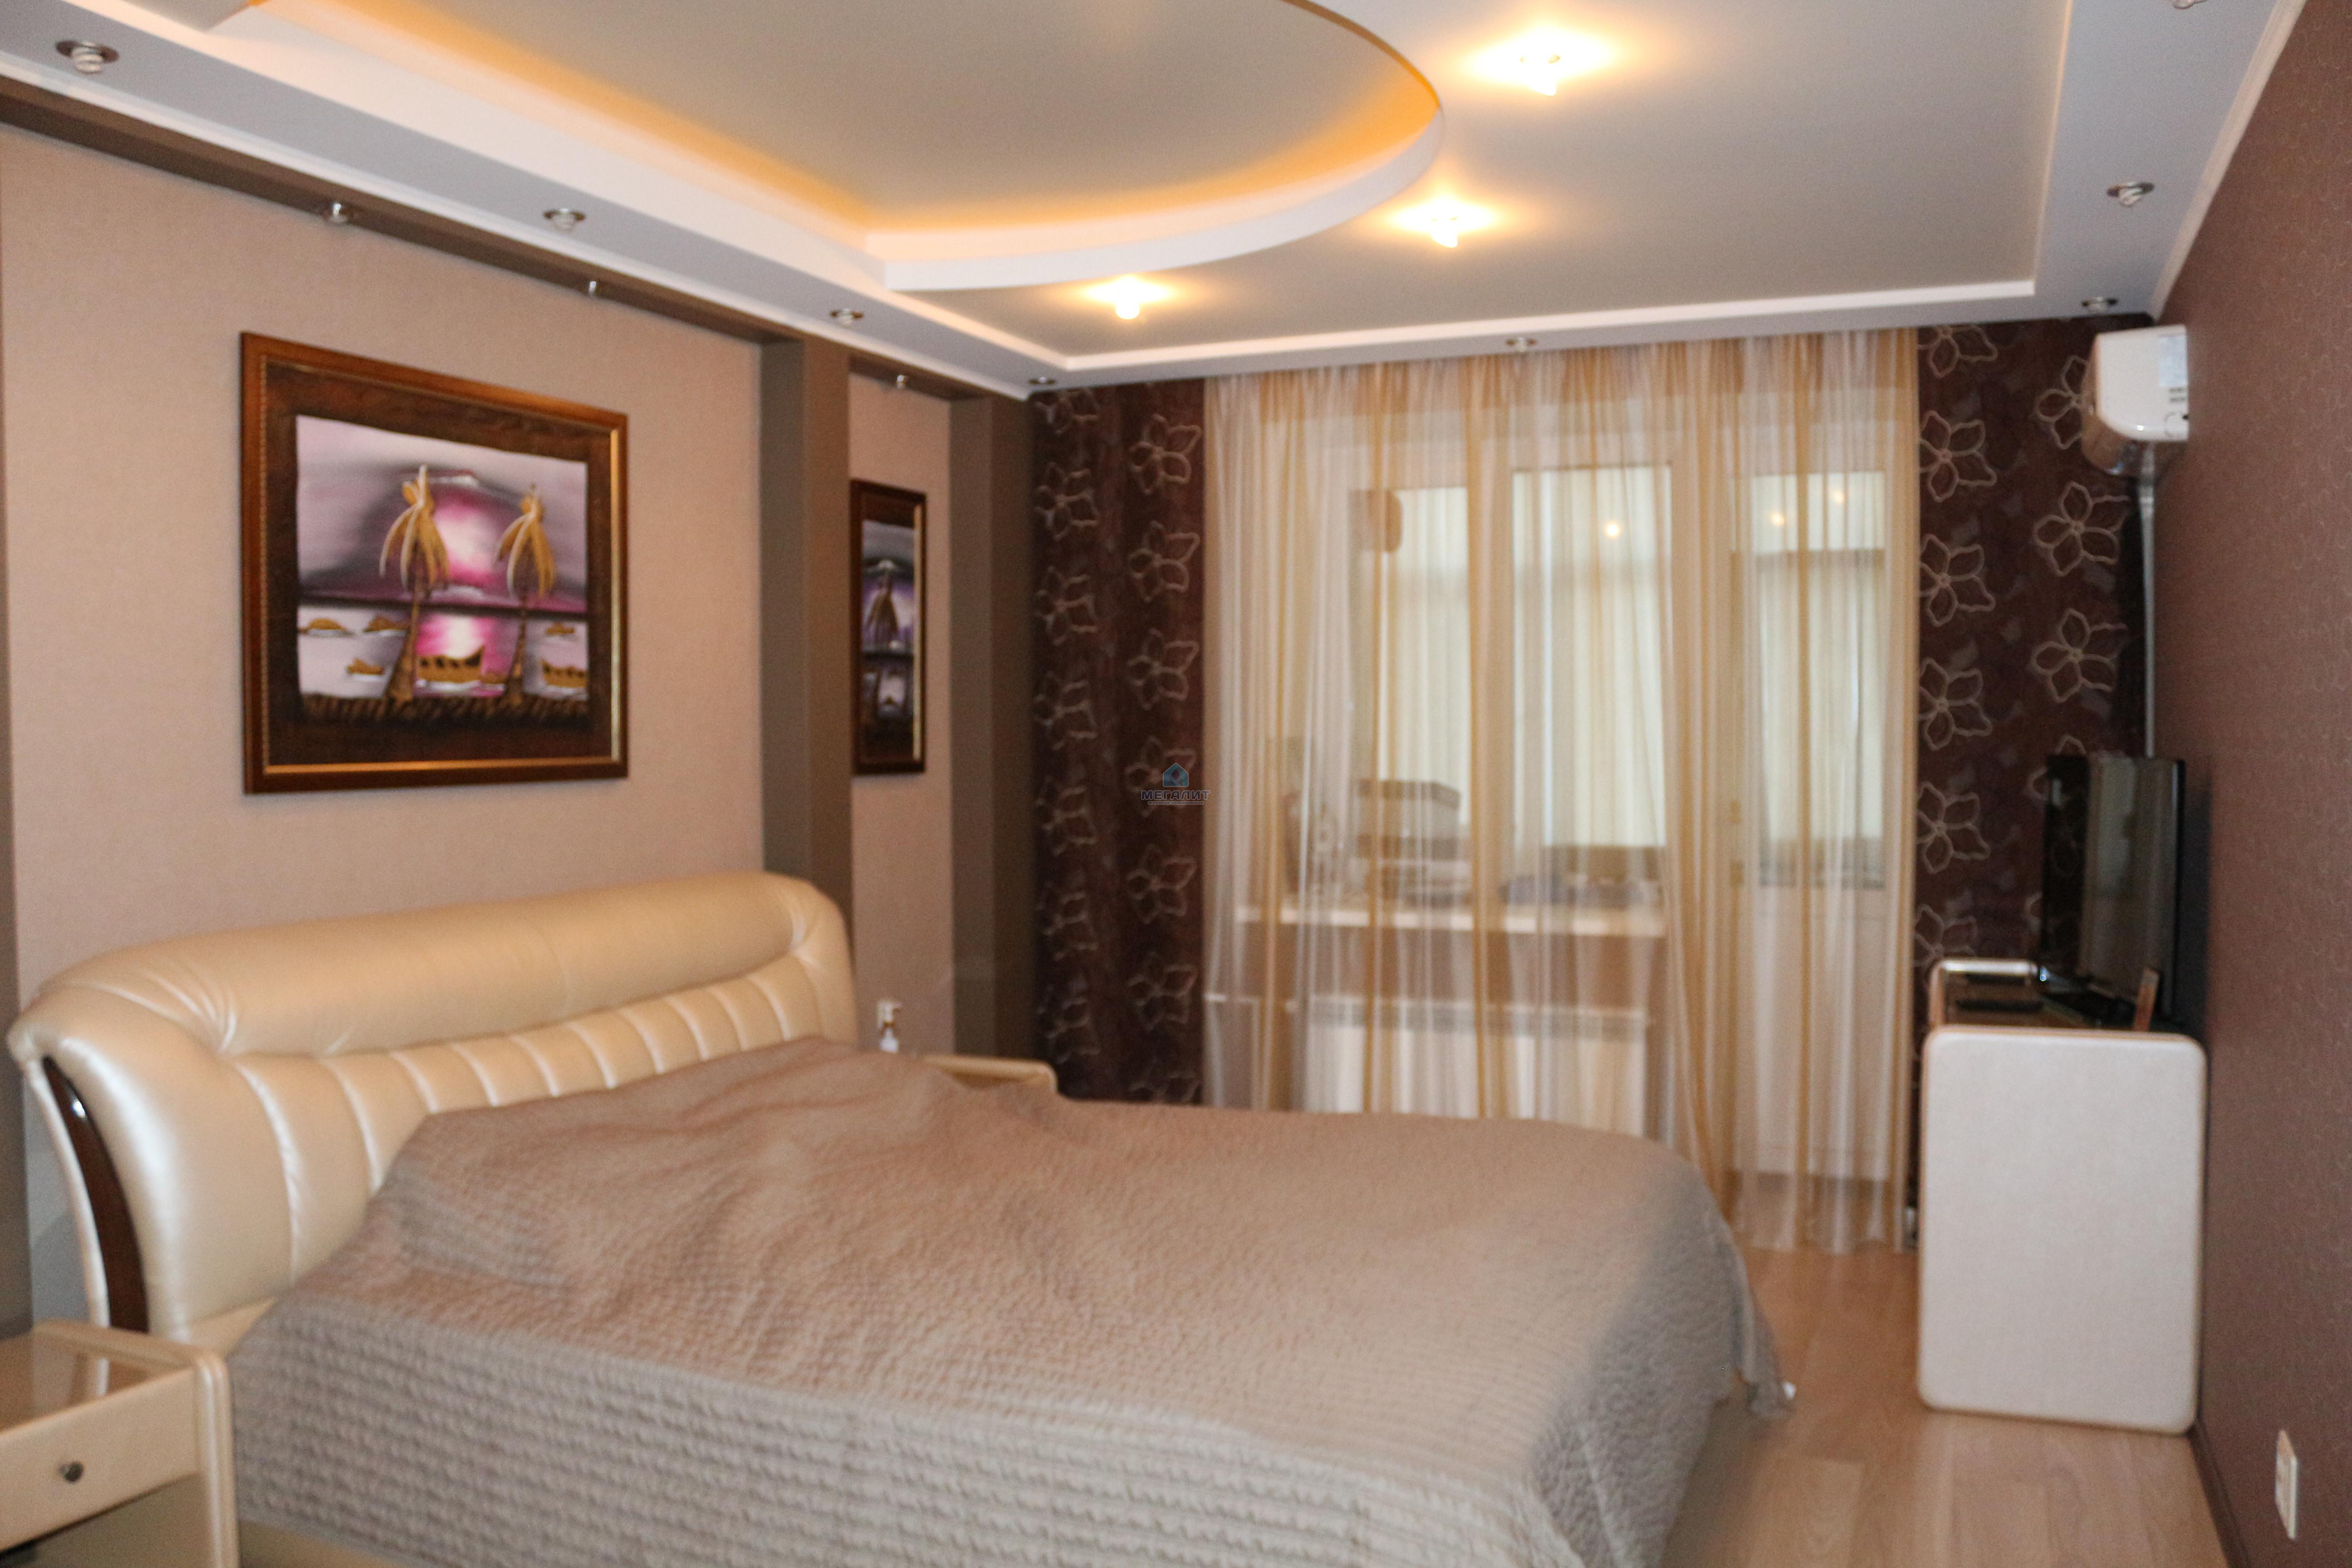 Продажа 3-к квартиры Мидхата Булатова 5, 105.0 м² (миниатюра №3)